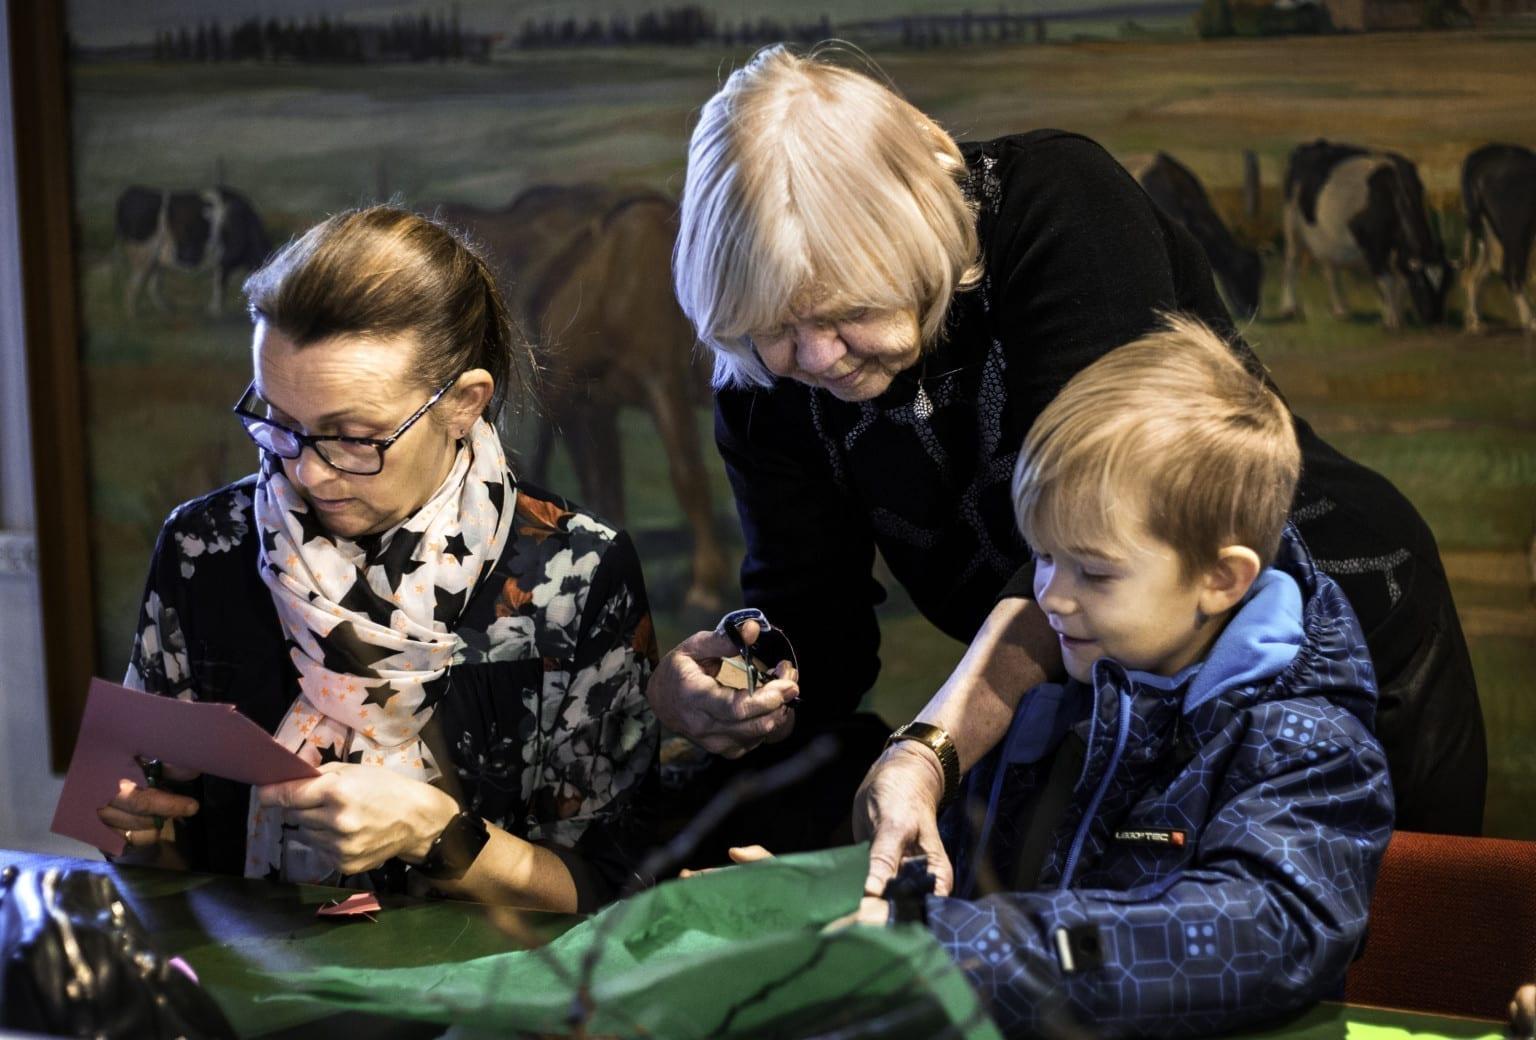 Vinterferie på Frilandsmuseet Herning med fastelavnstema